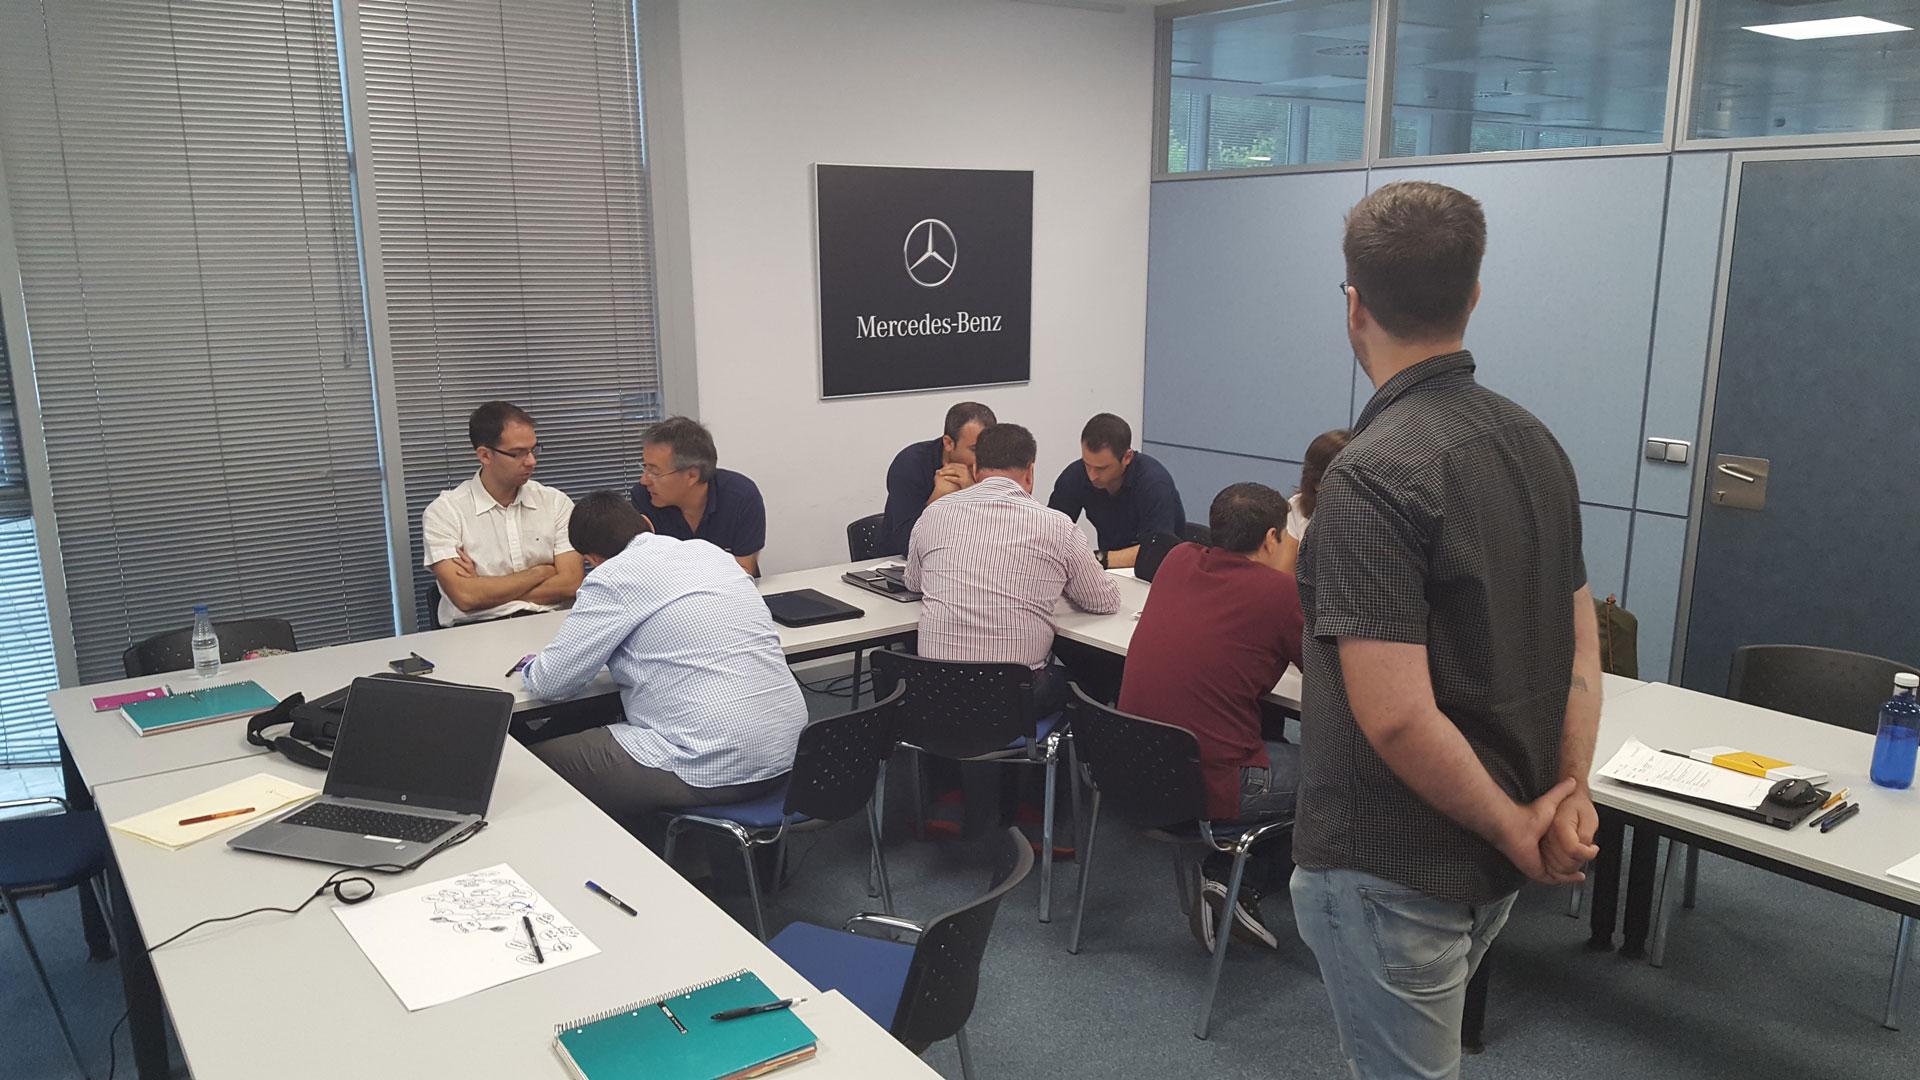 Mercedes Benz, iphonedroid